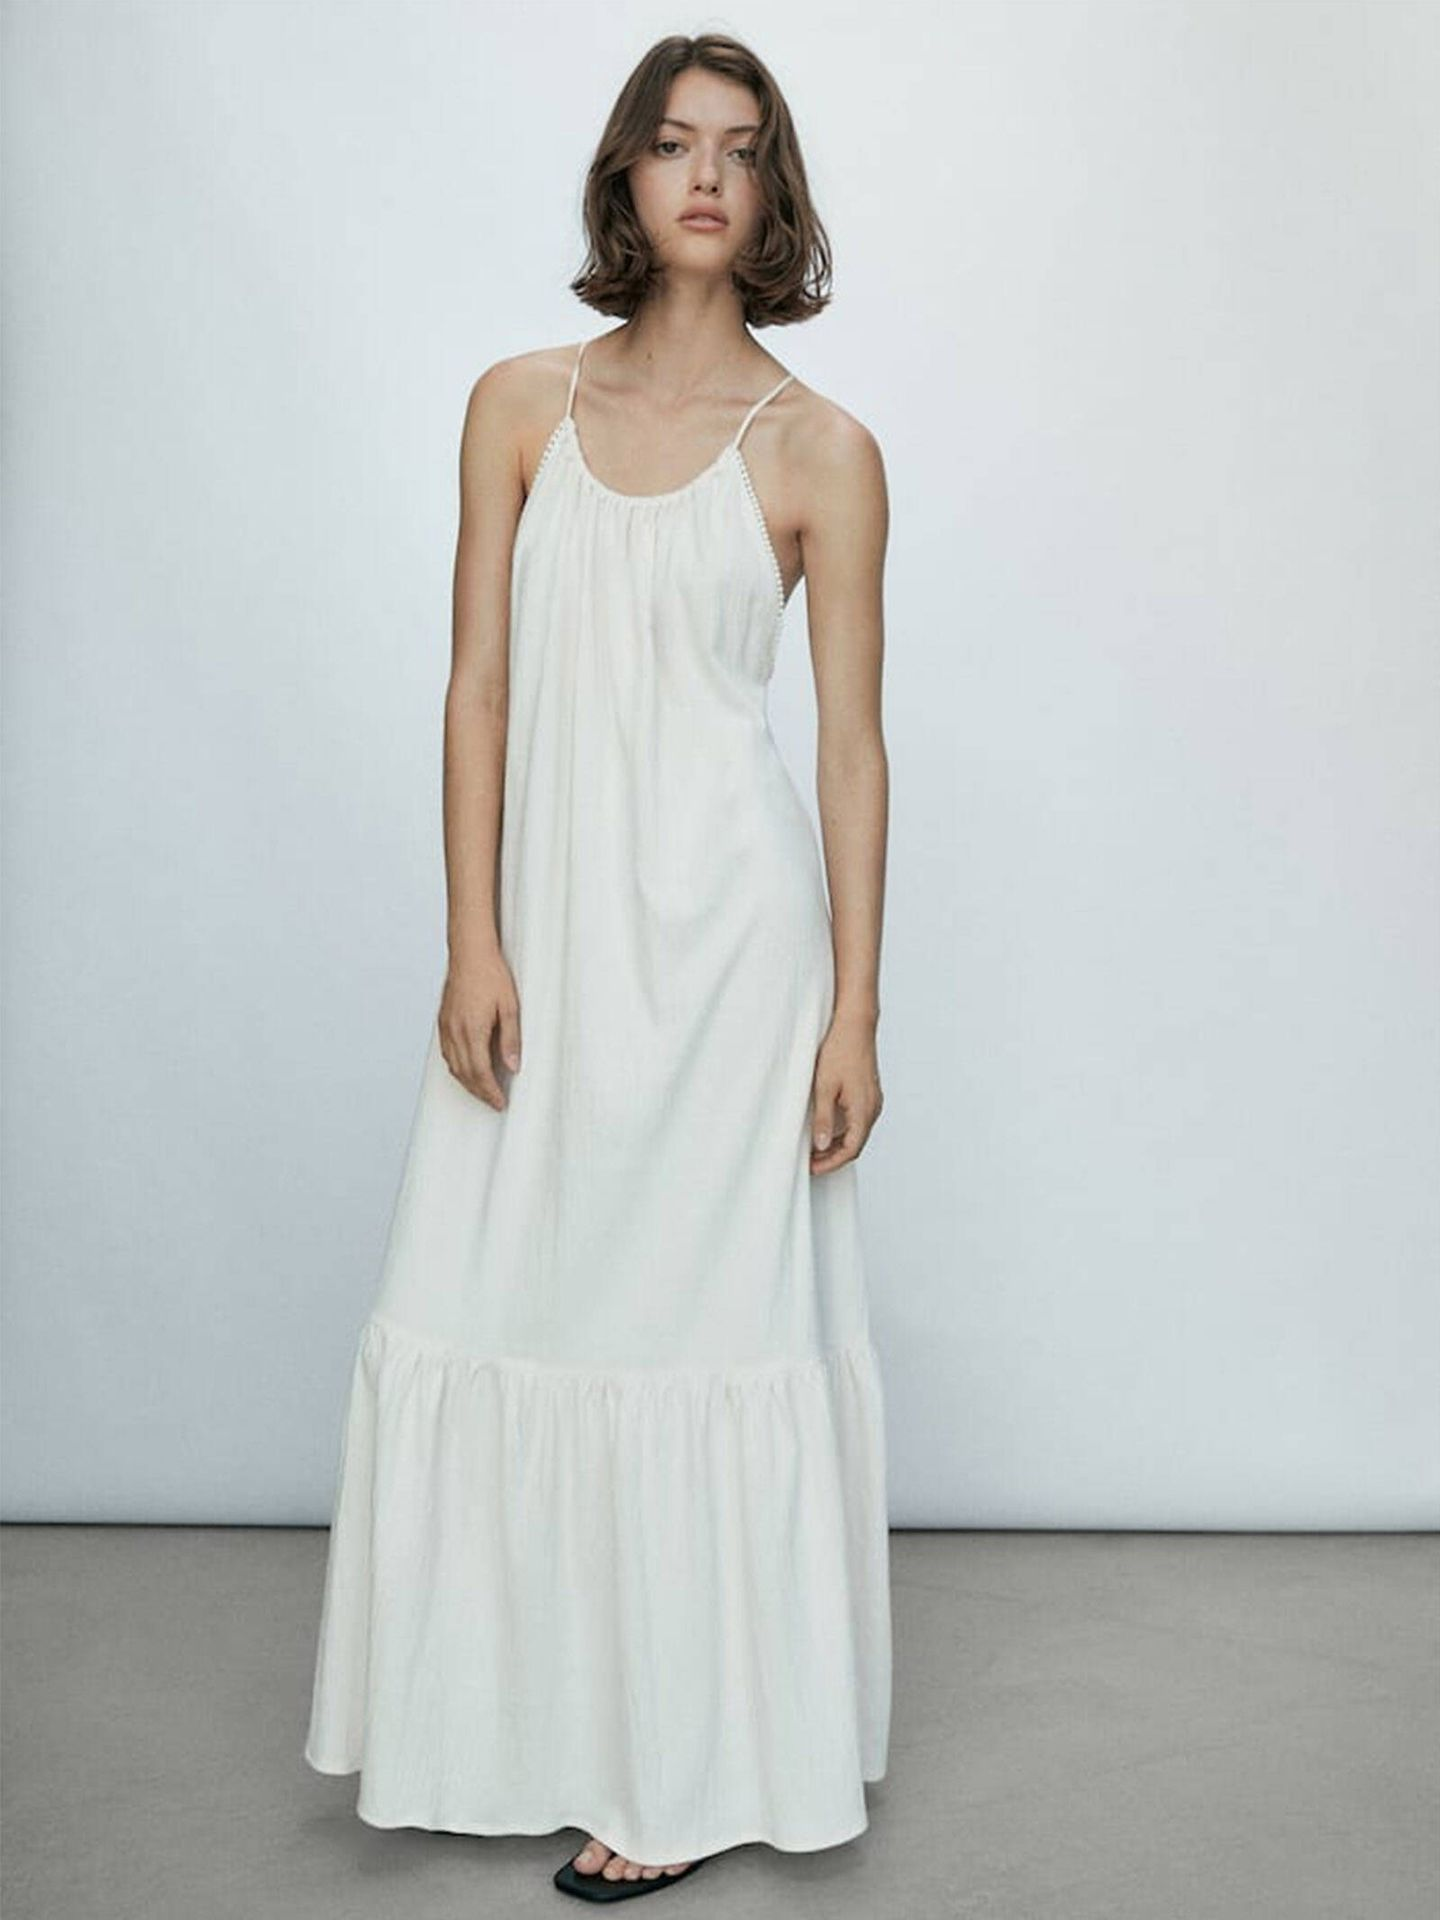 Vestido blanco low cost de Massimo Dutti. (Cortesía)